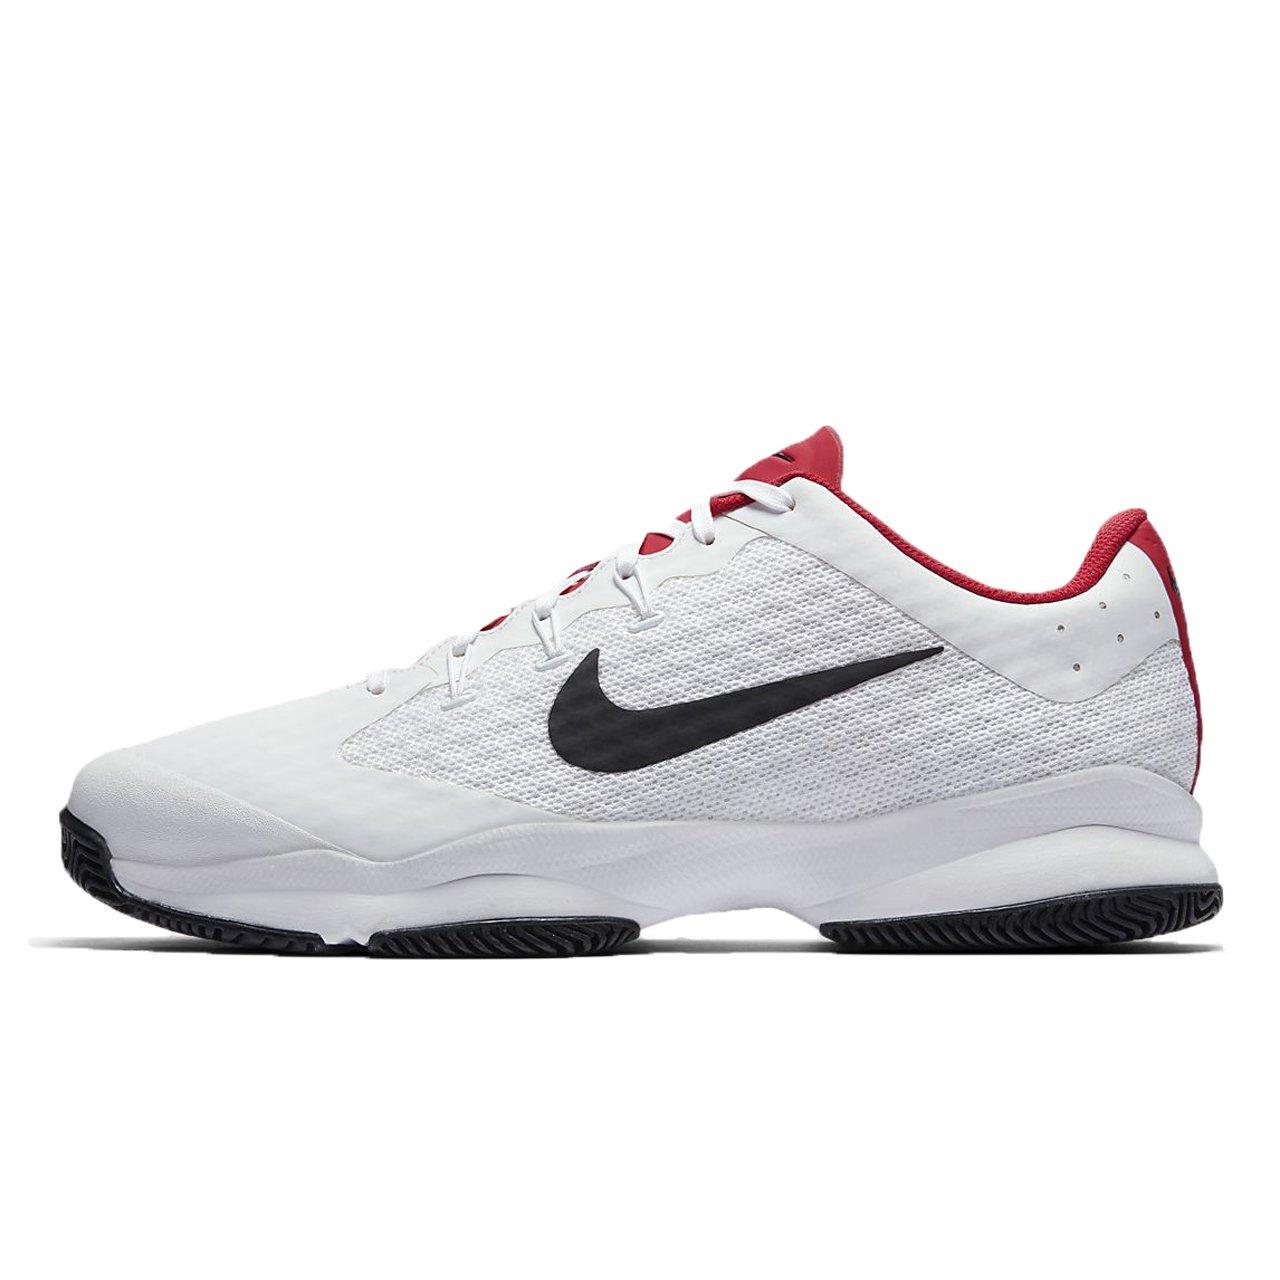 NIKE Men's Air Zoom Ultra Tennis Shoe B071SDF4J6 11.5 M US|White/Black/University Red